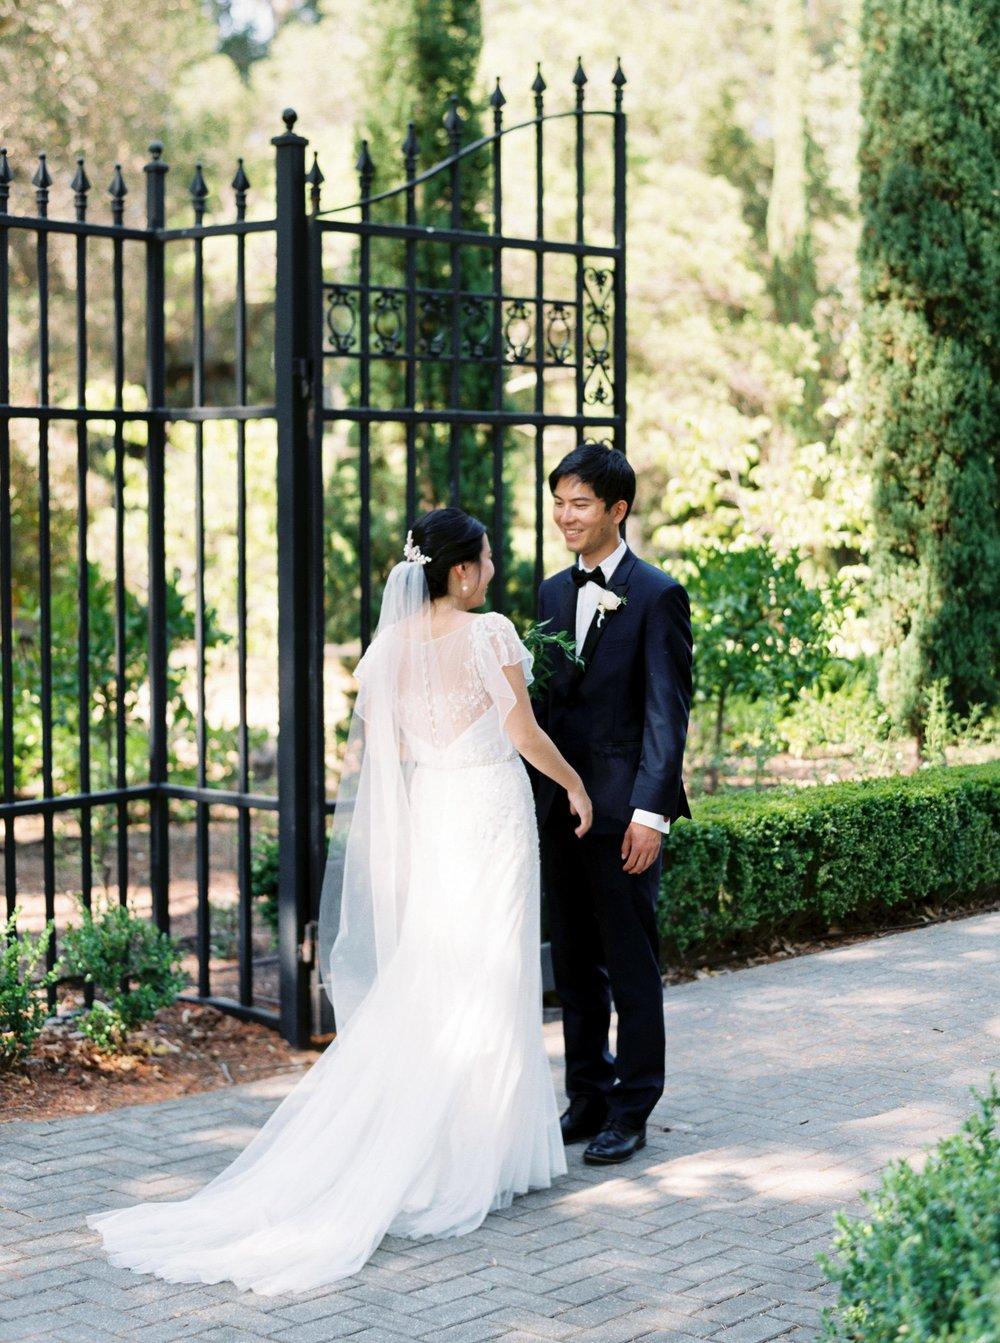 Villa_Montalvo_Wedding_Photographer_Videographer_San_Francisco066.jpg